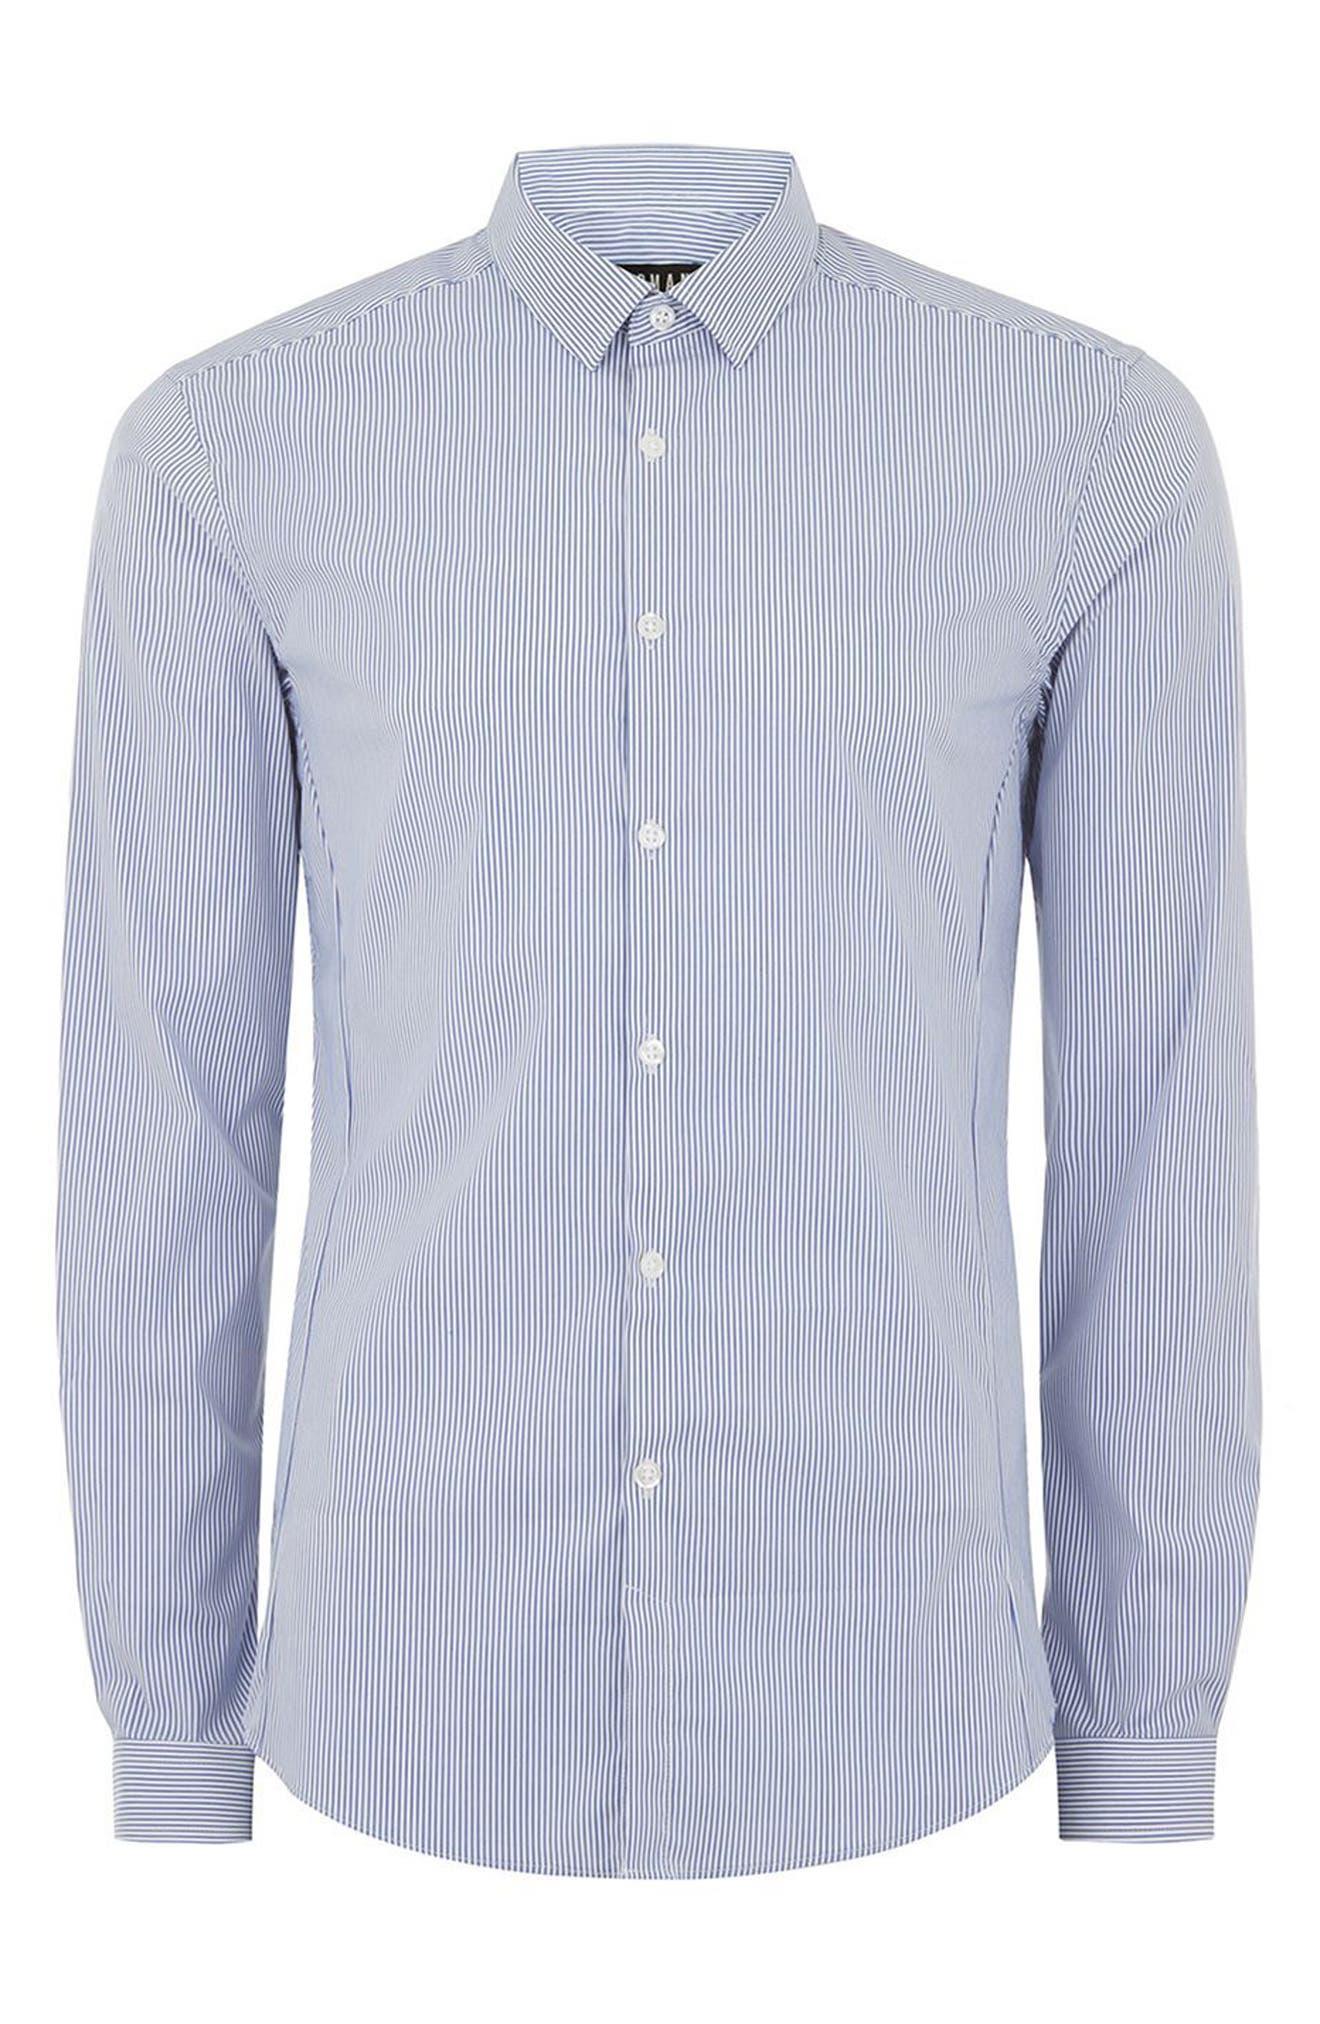 Muscle Fit Smart Shirt,                             Alternate thumbnail 6, color,                             Blue Multi